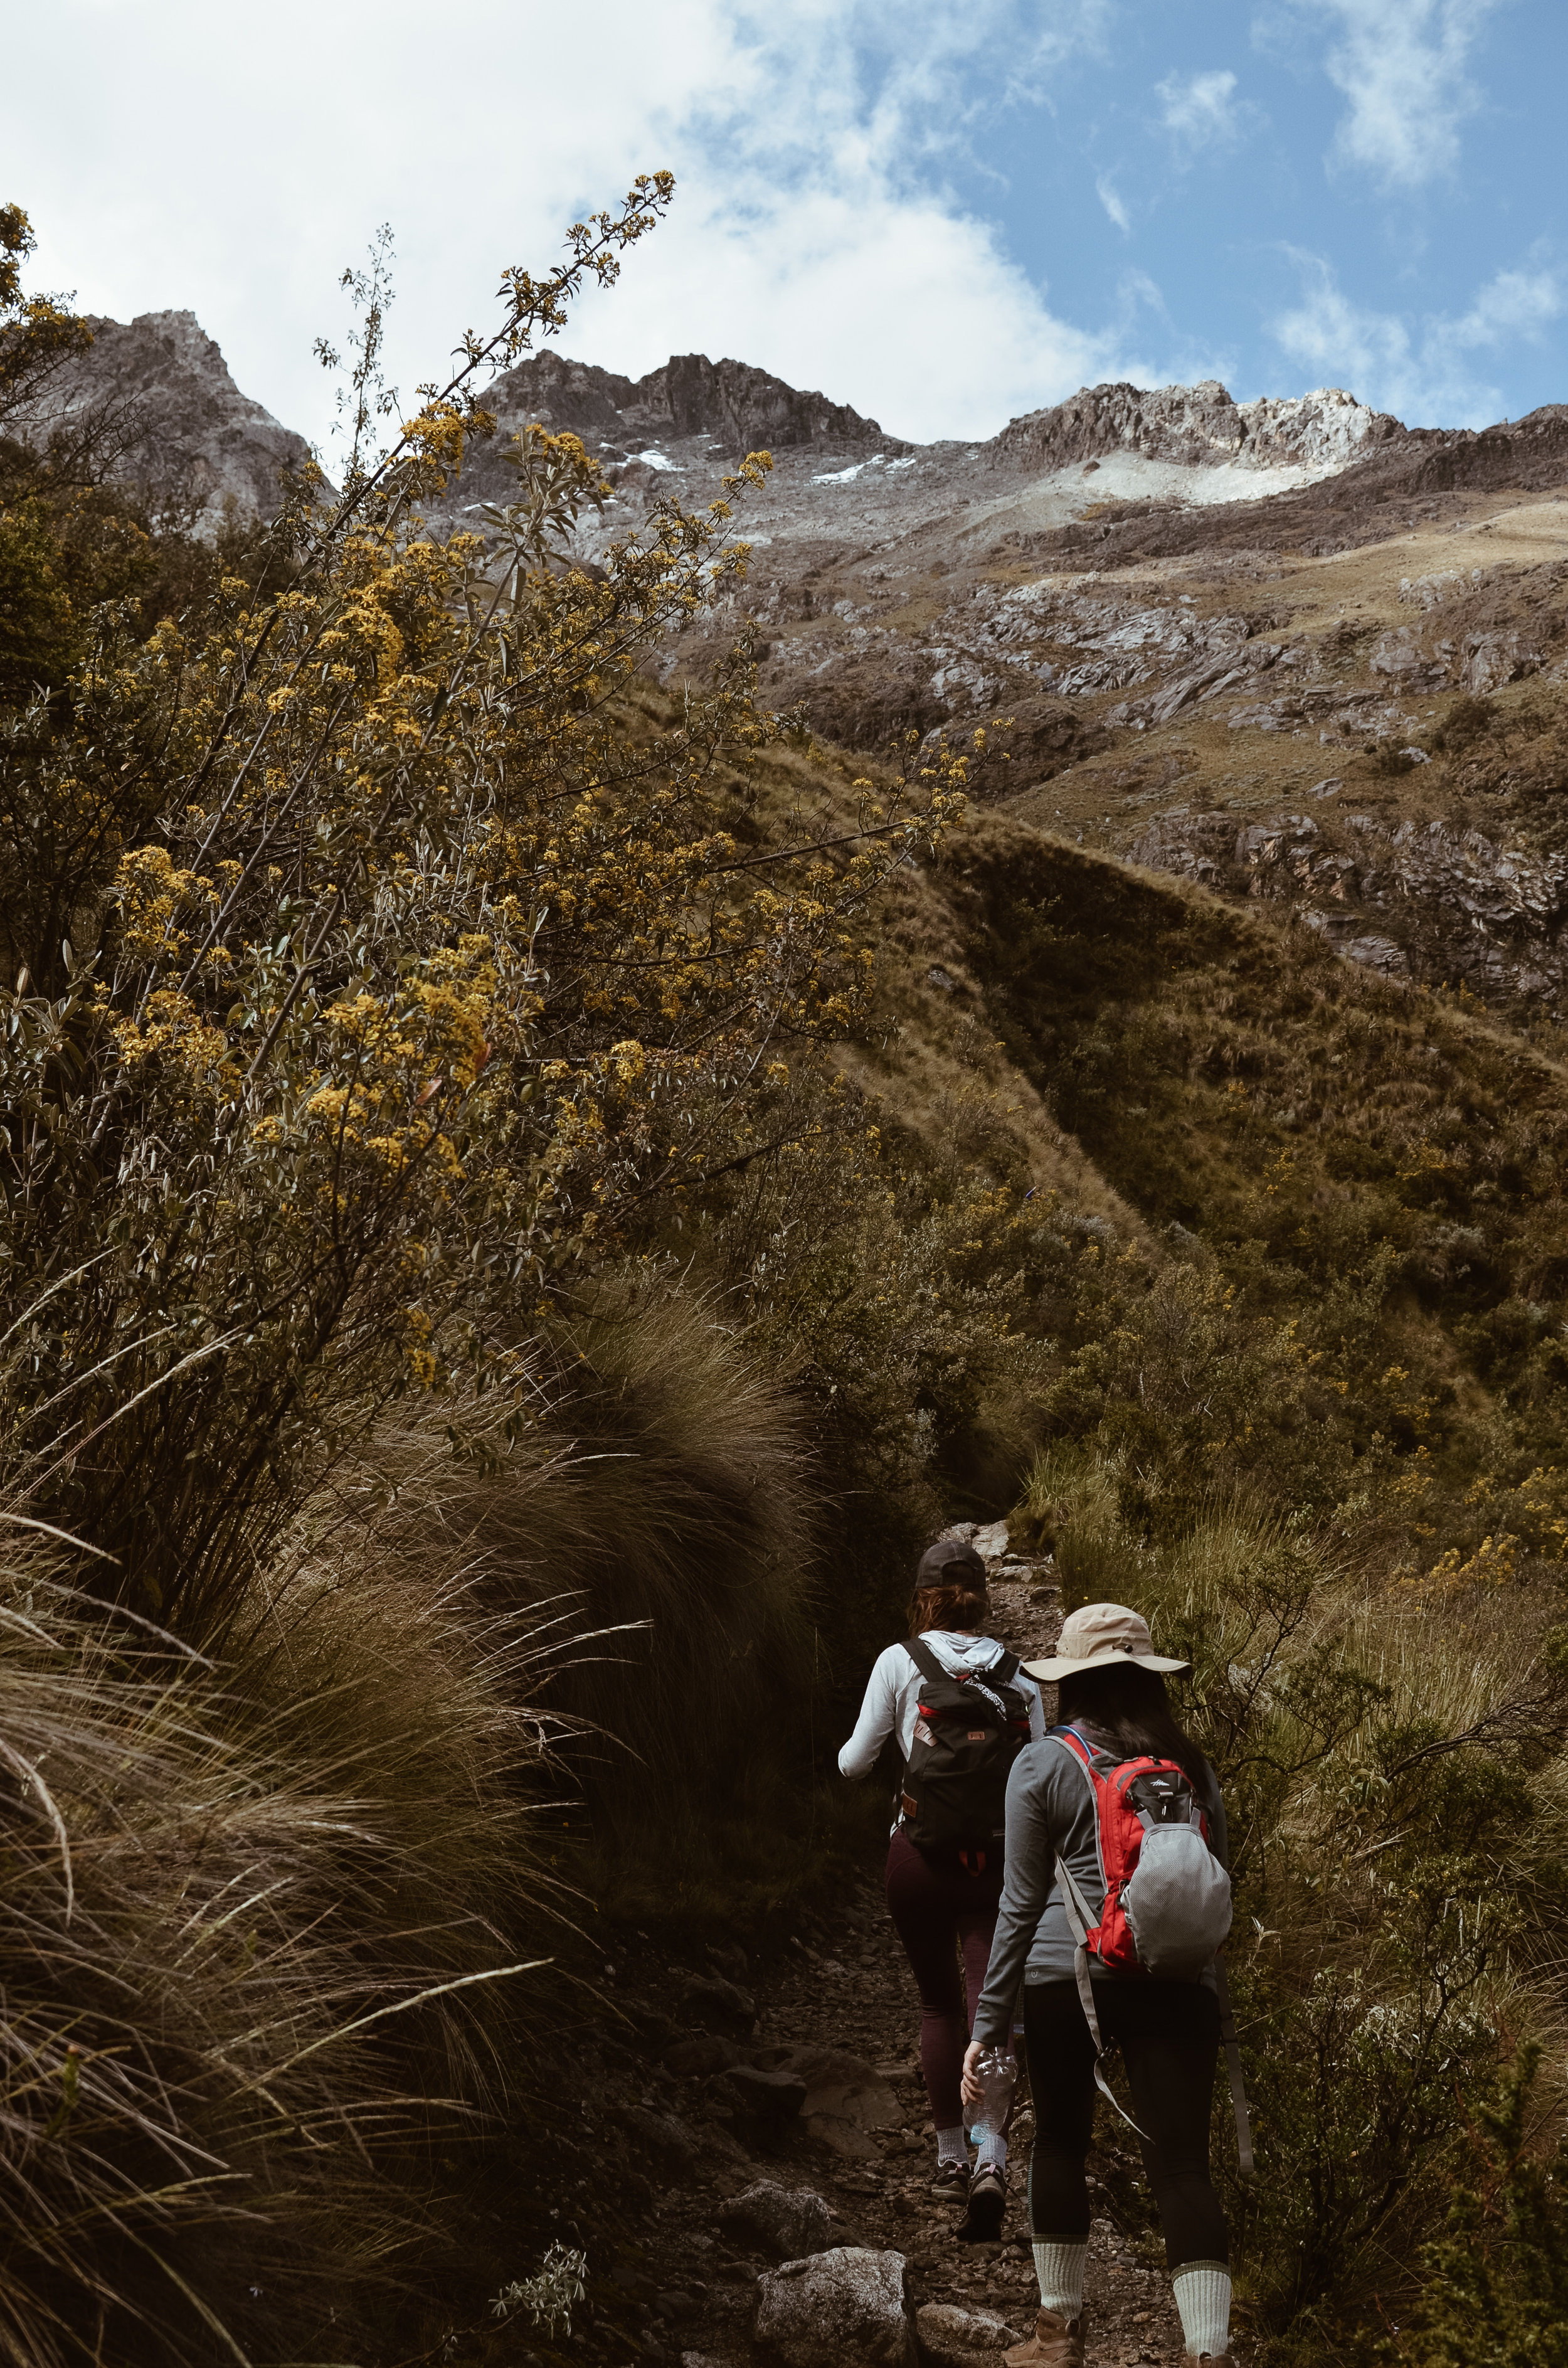 laguna+lake+69+hike+peru+travel+guide+life+on+pine_DSC_0474.jpg